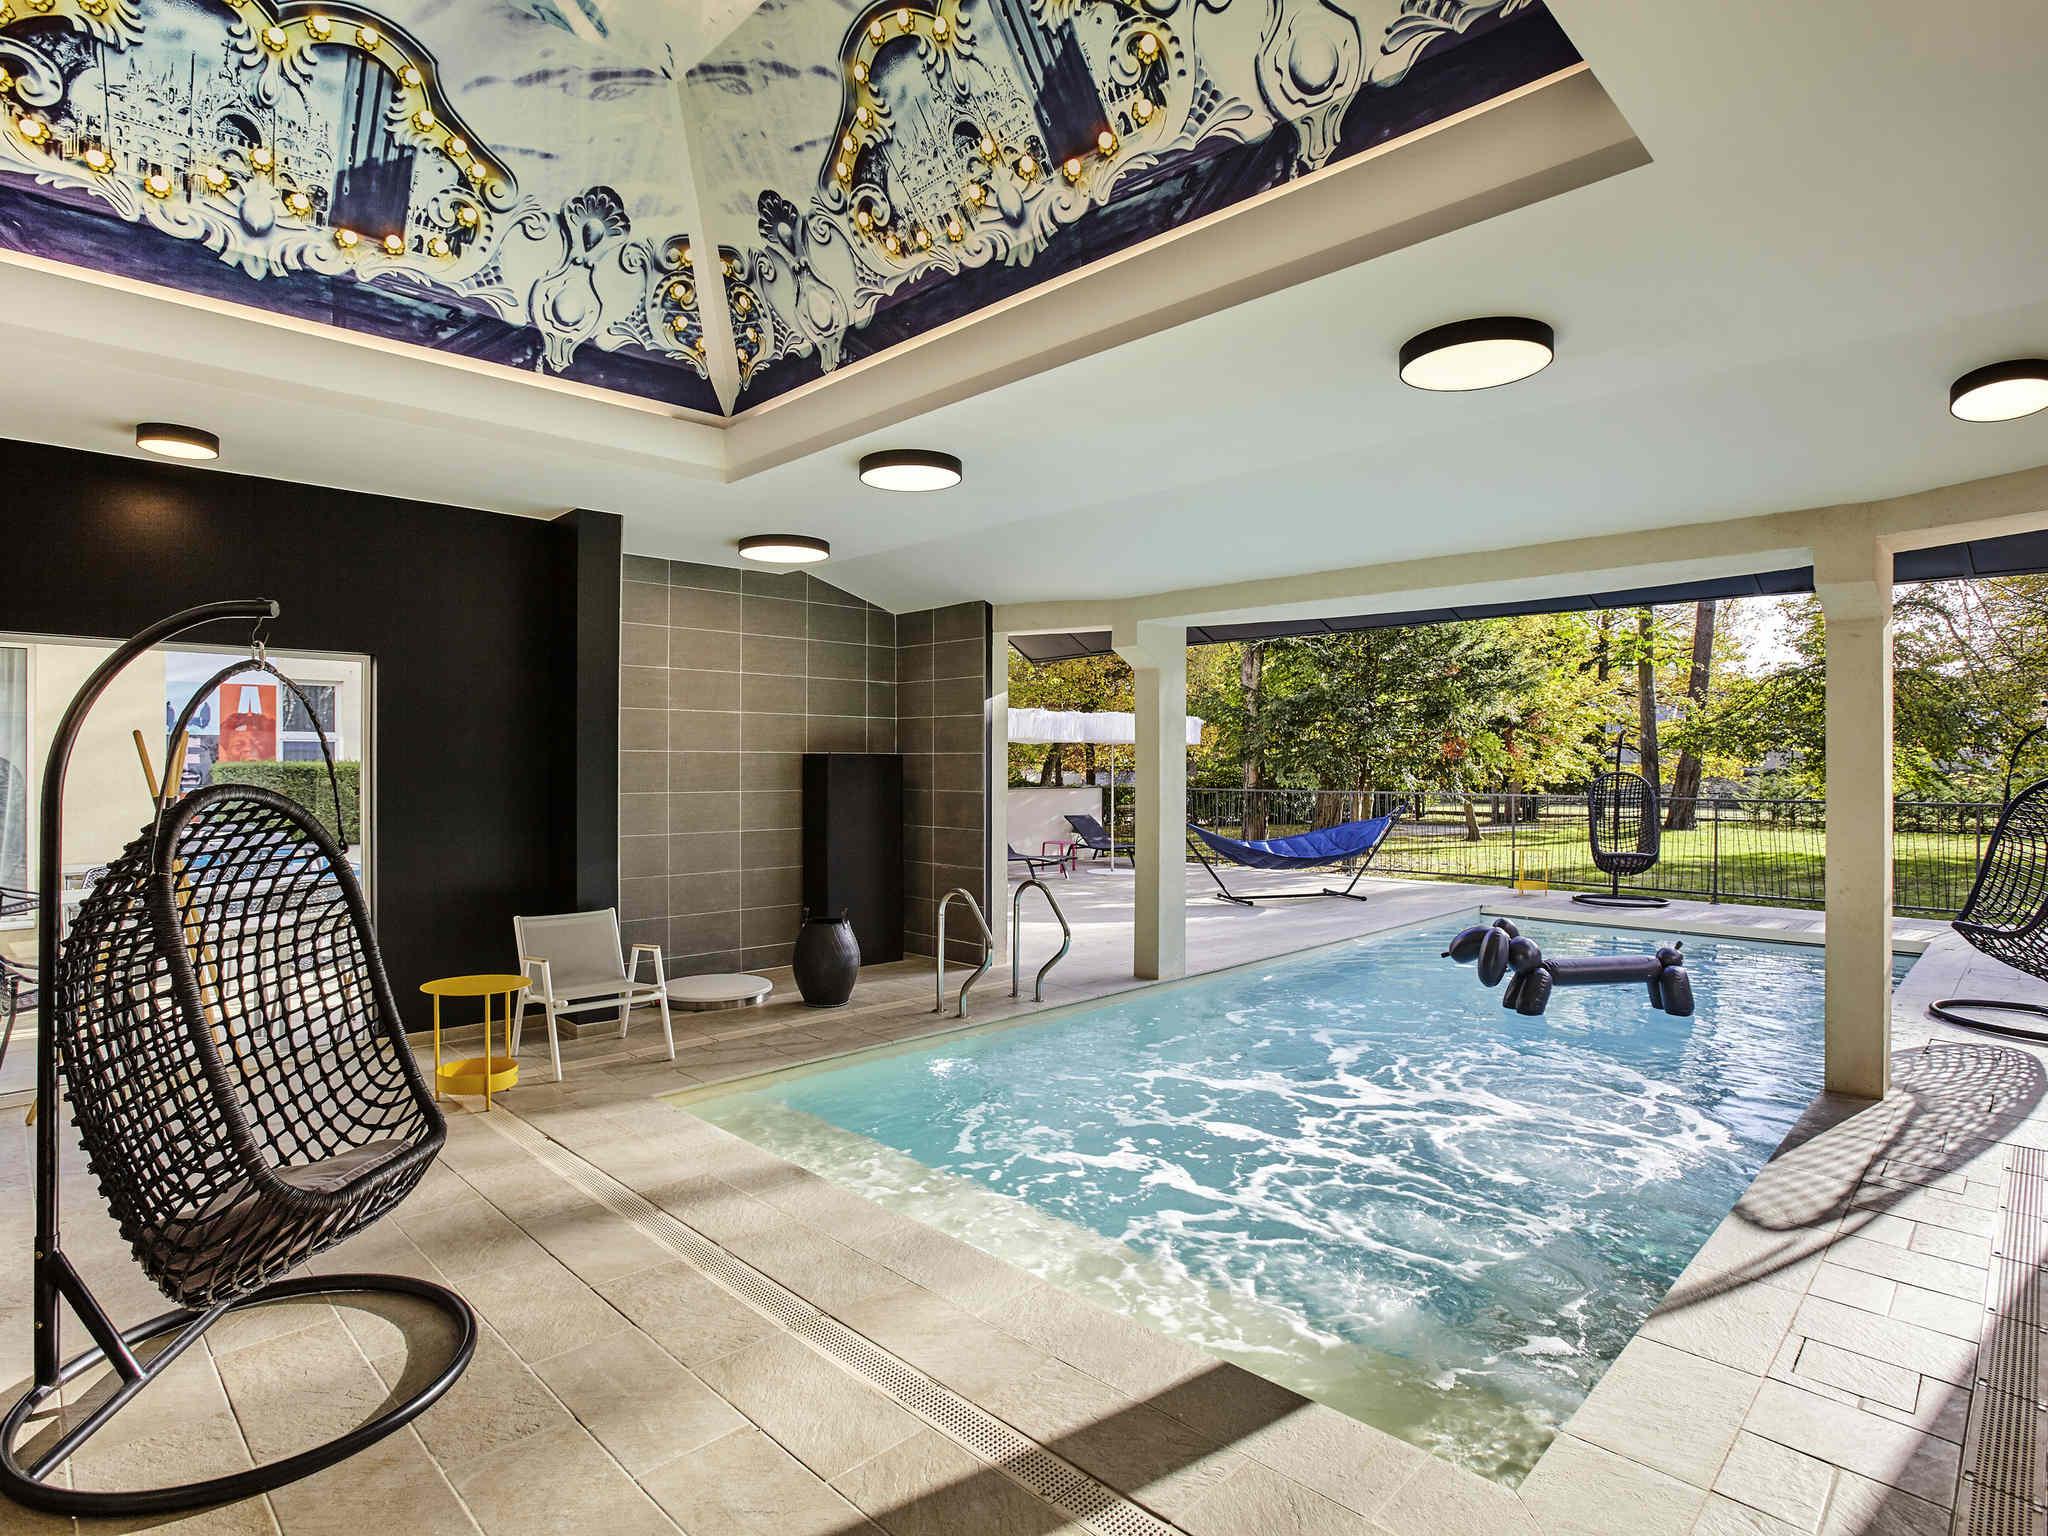 Hotel in fontainebleau mercure ch teau de fontainebleau for Hotel fontainebleau france